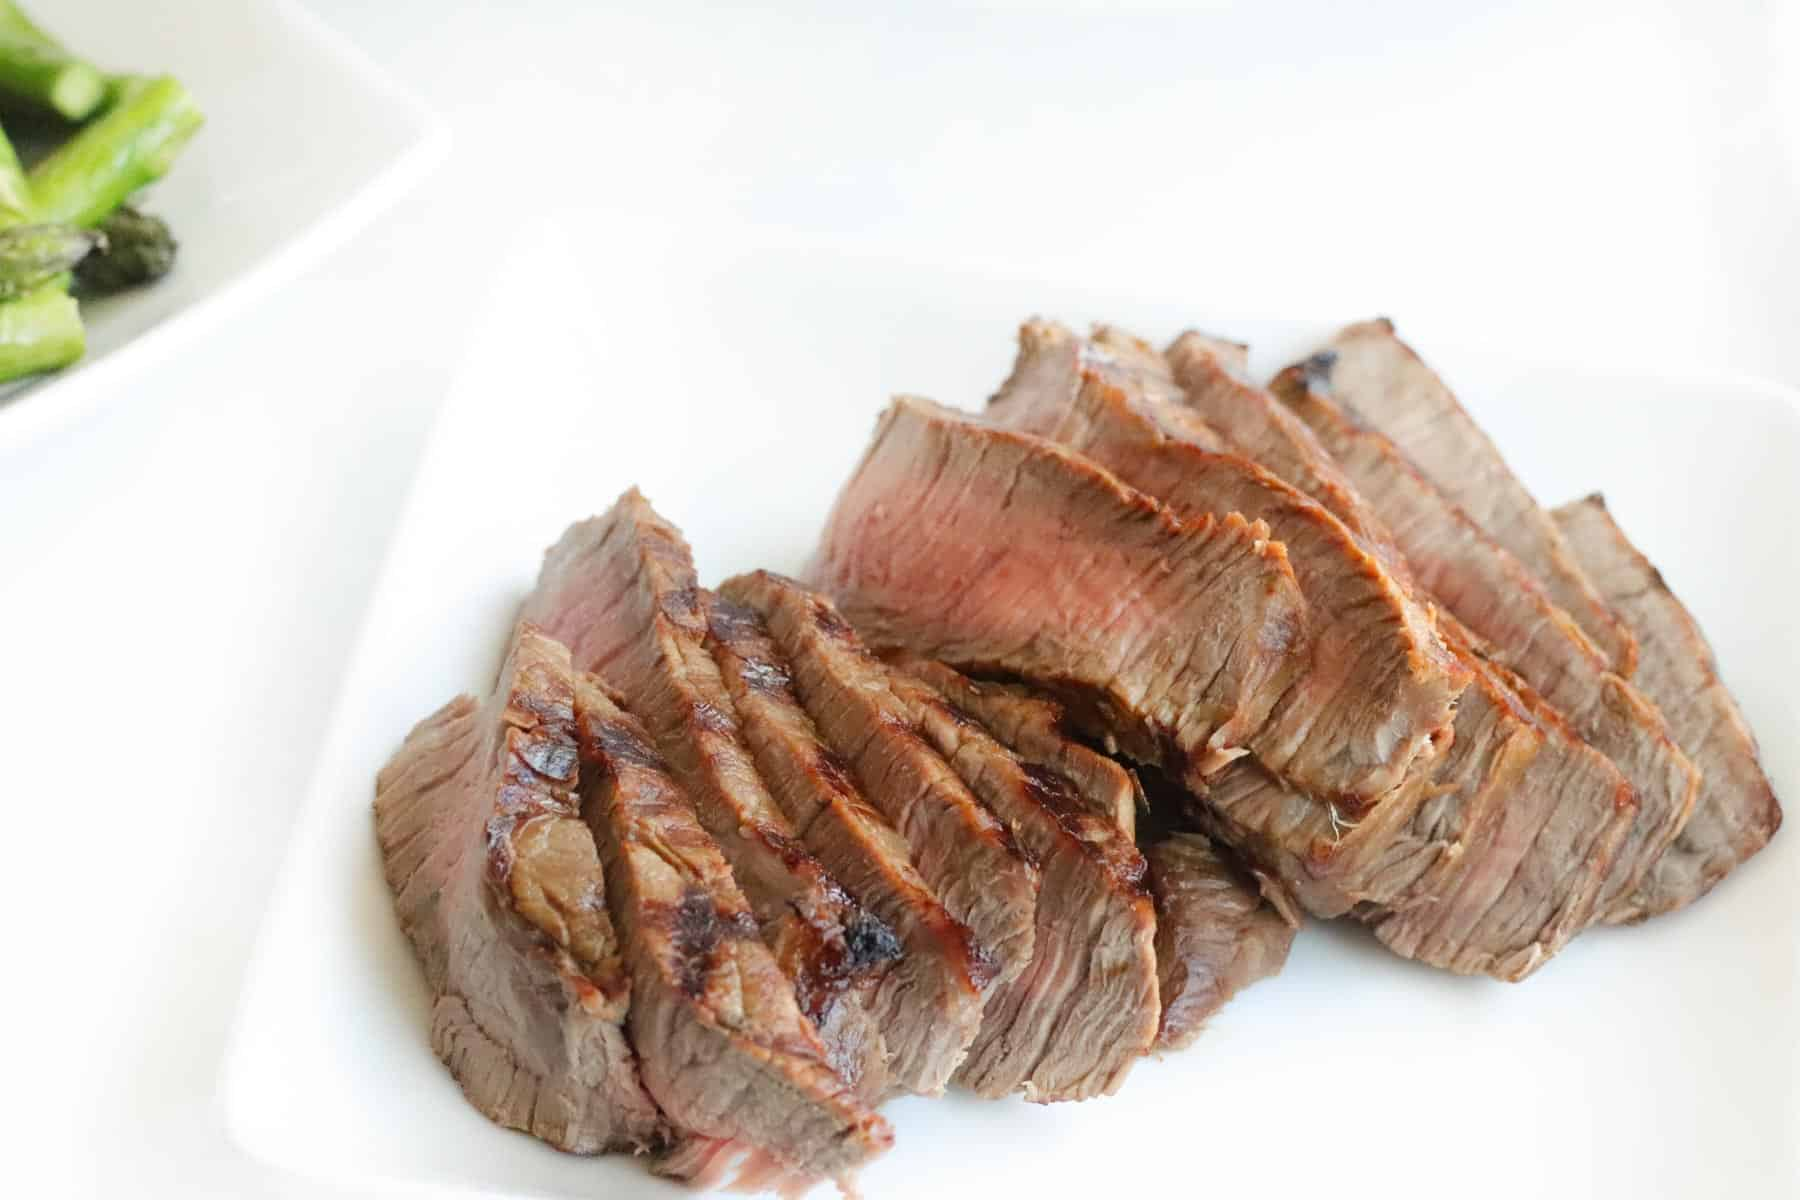 sliced gilled steak on a plate